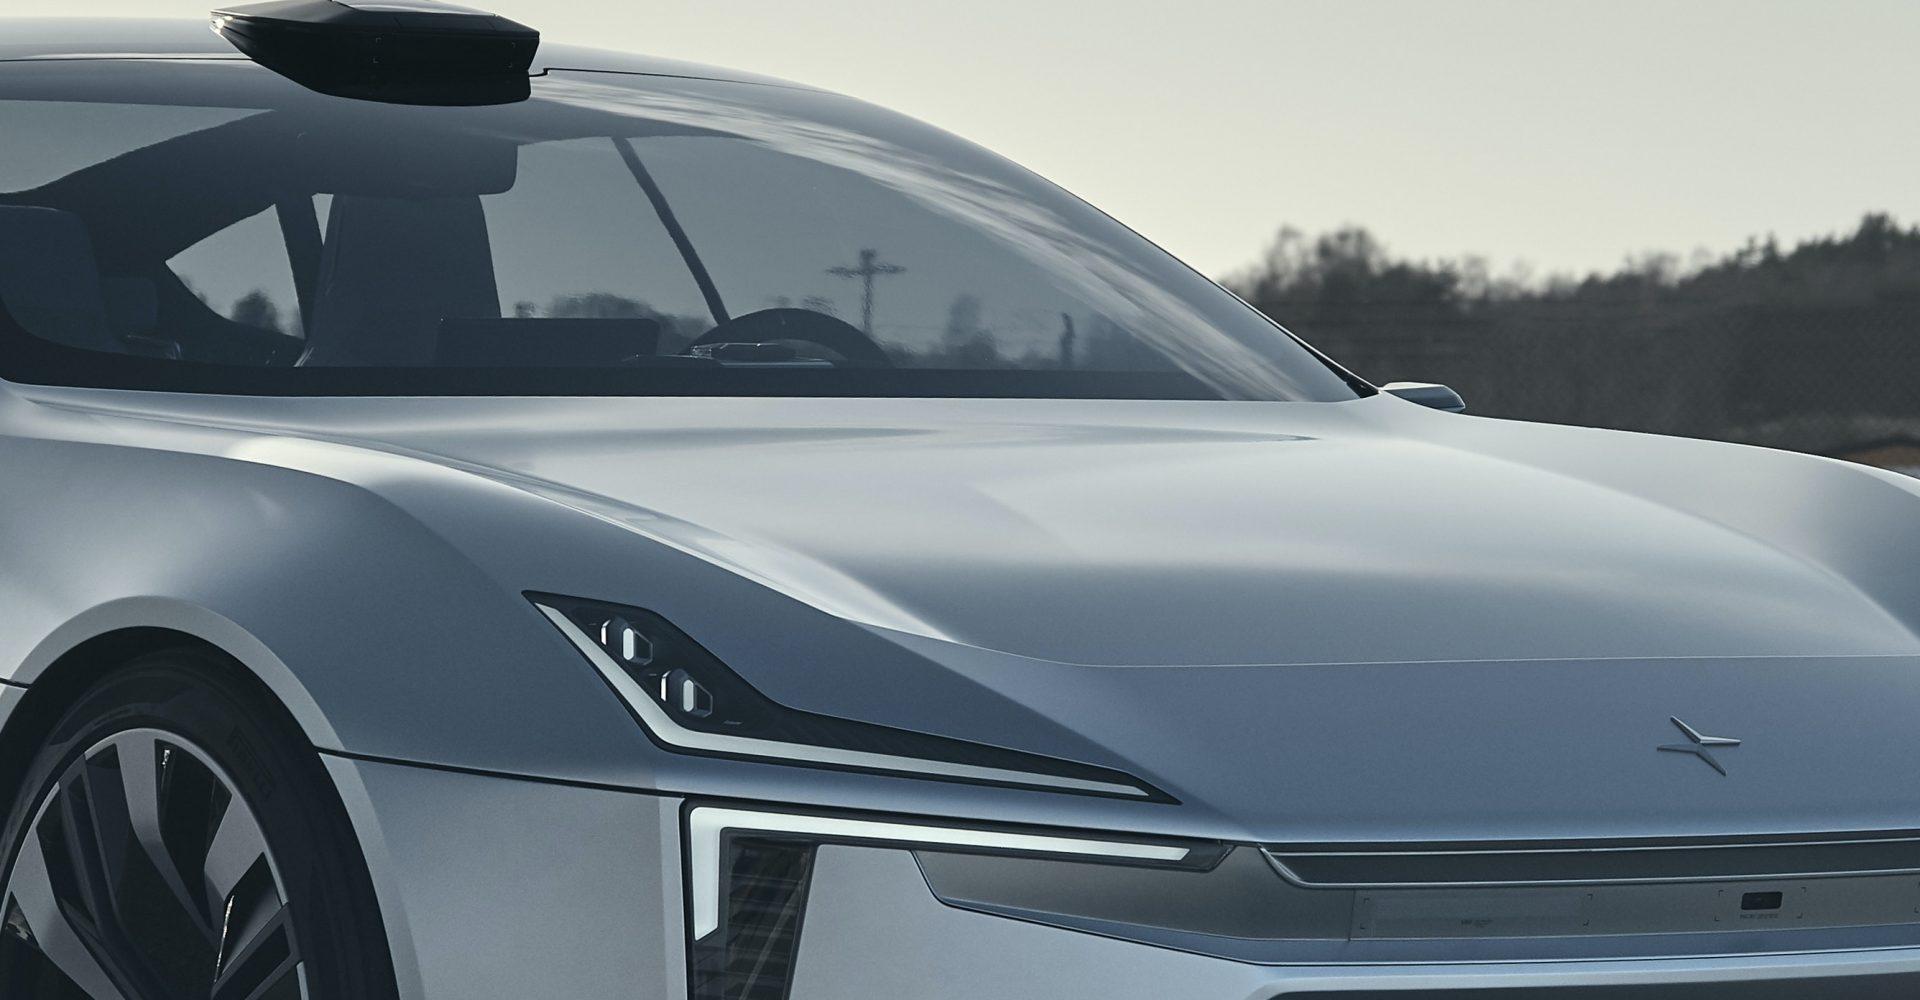 Future Polestar vehicles will feature Waymo self-driving technology